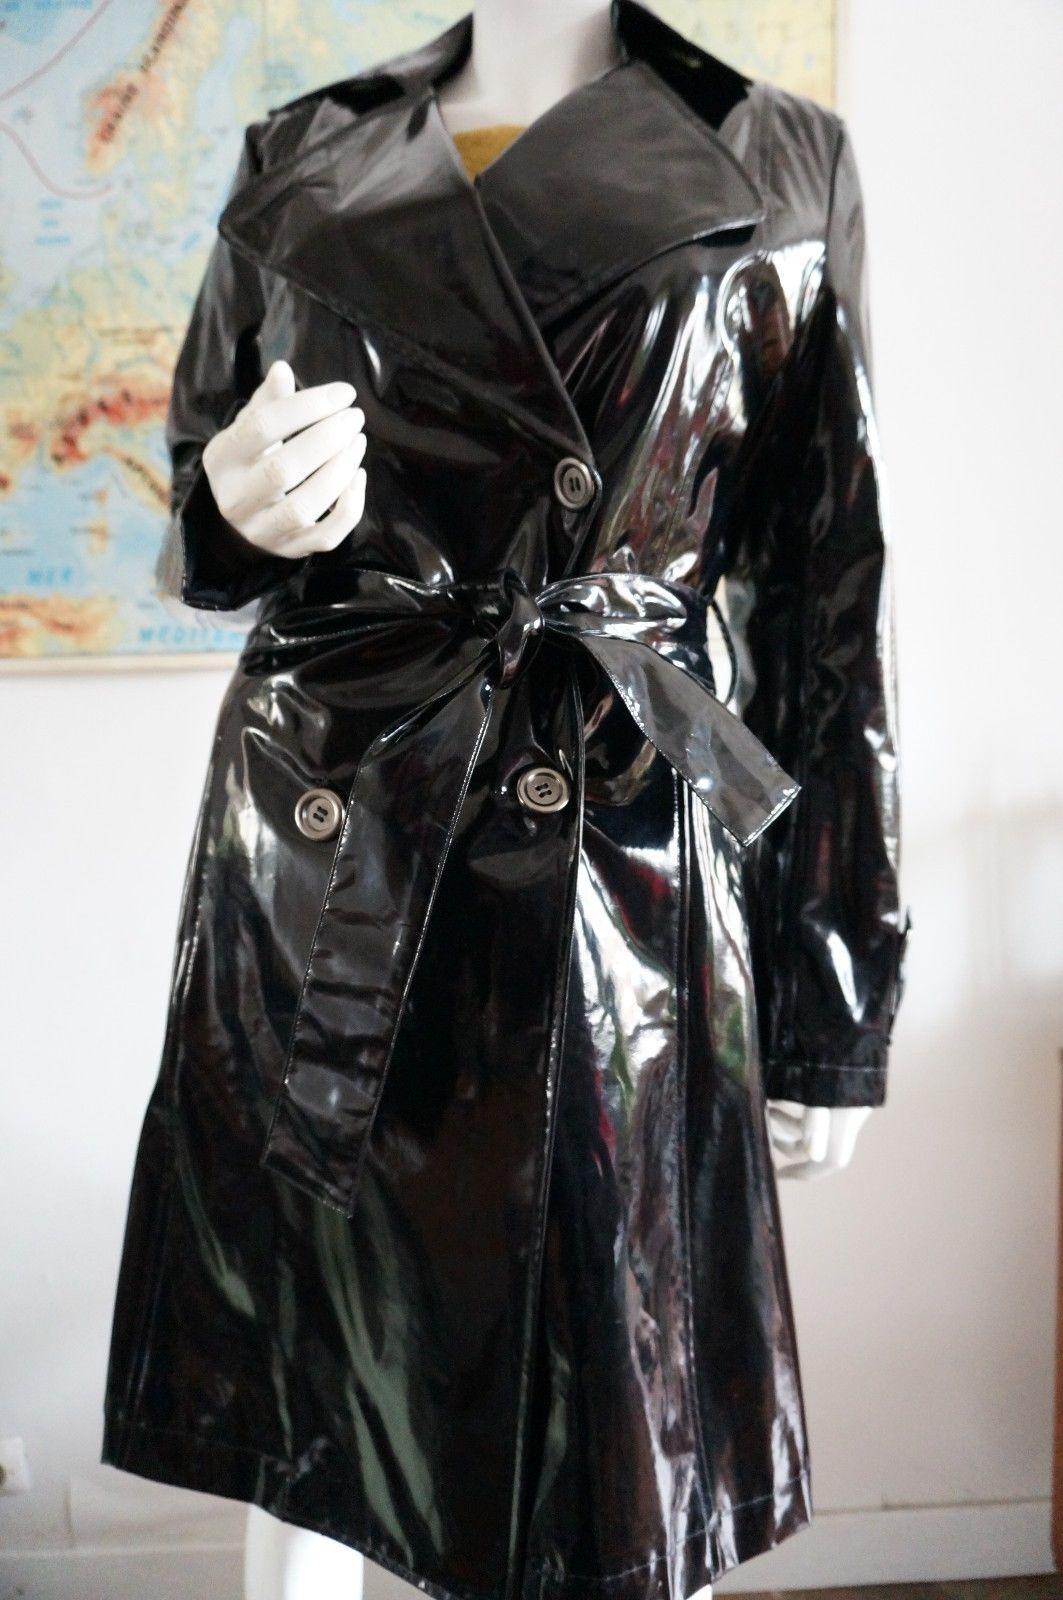 Cir 233 Taille 38 Trench Coat Vnyl Pvc Noir Brillant